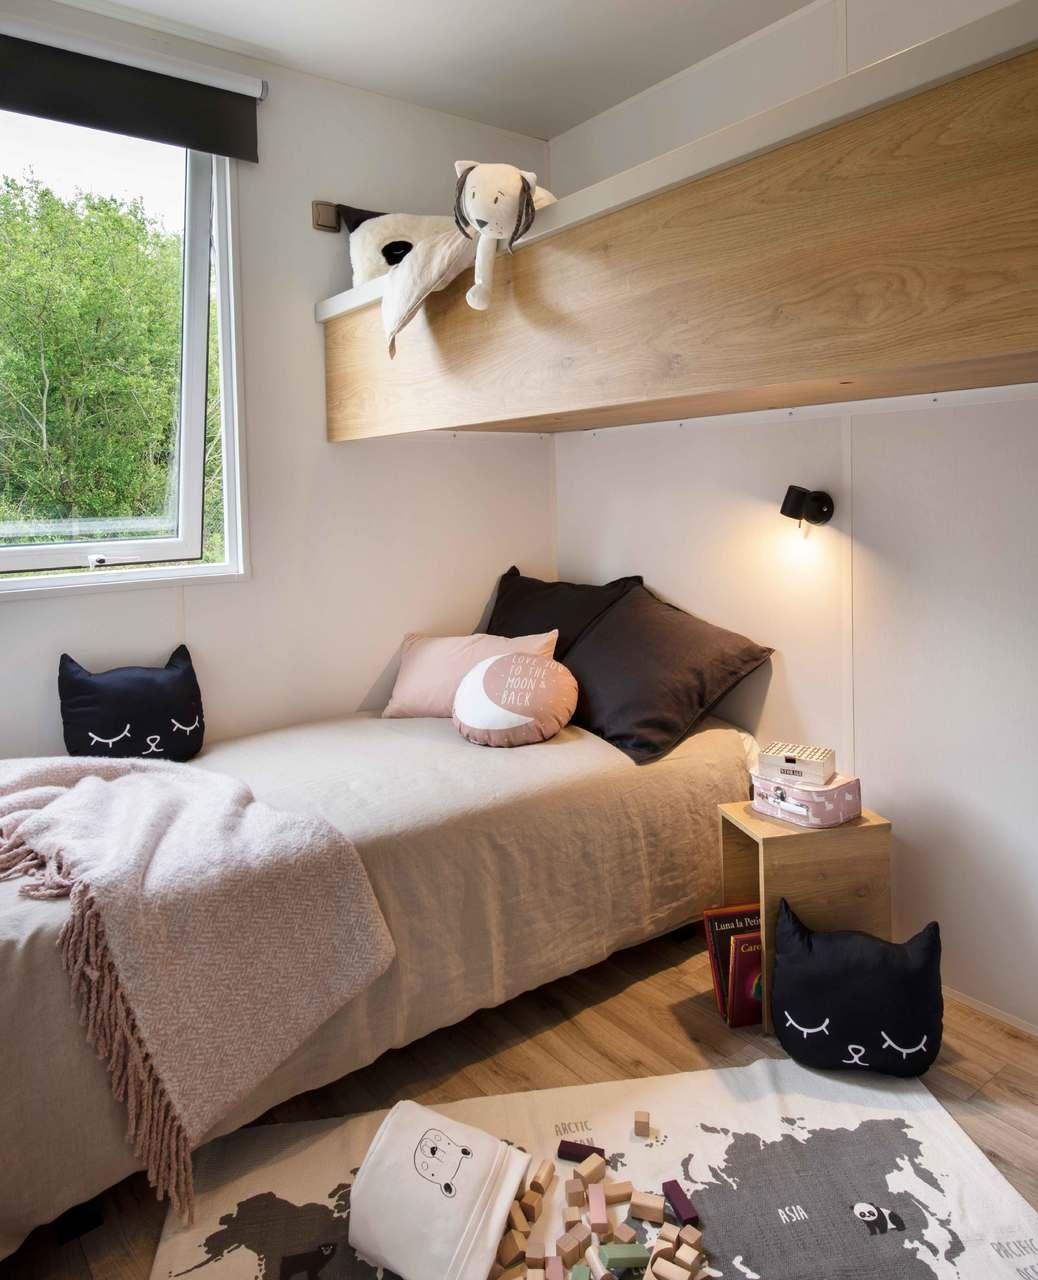 Mobil-home 3 chambres 884 3ch - Côté jardin 5